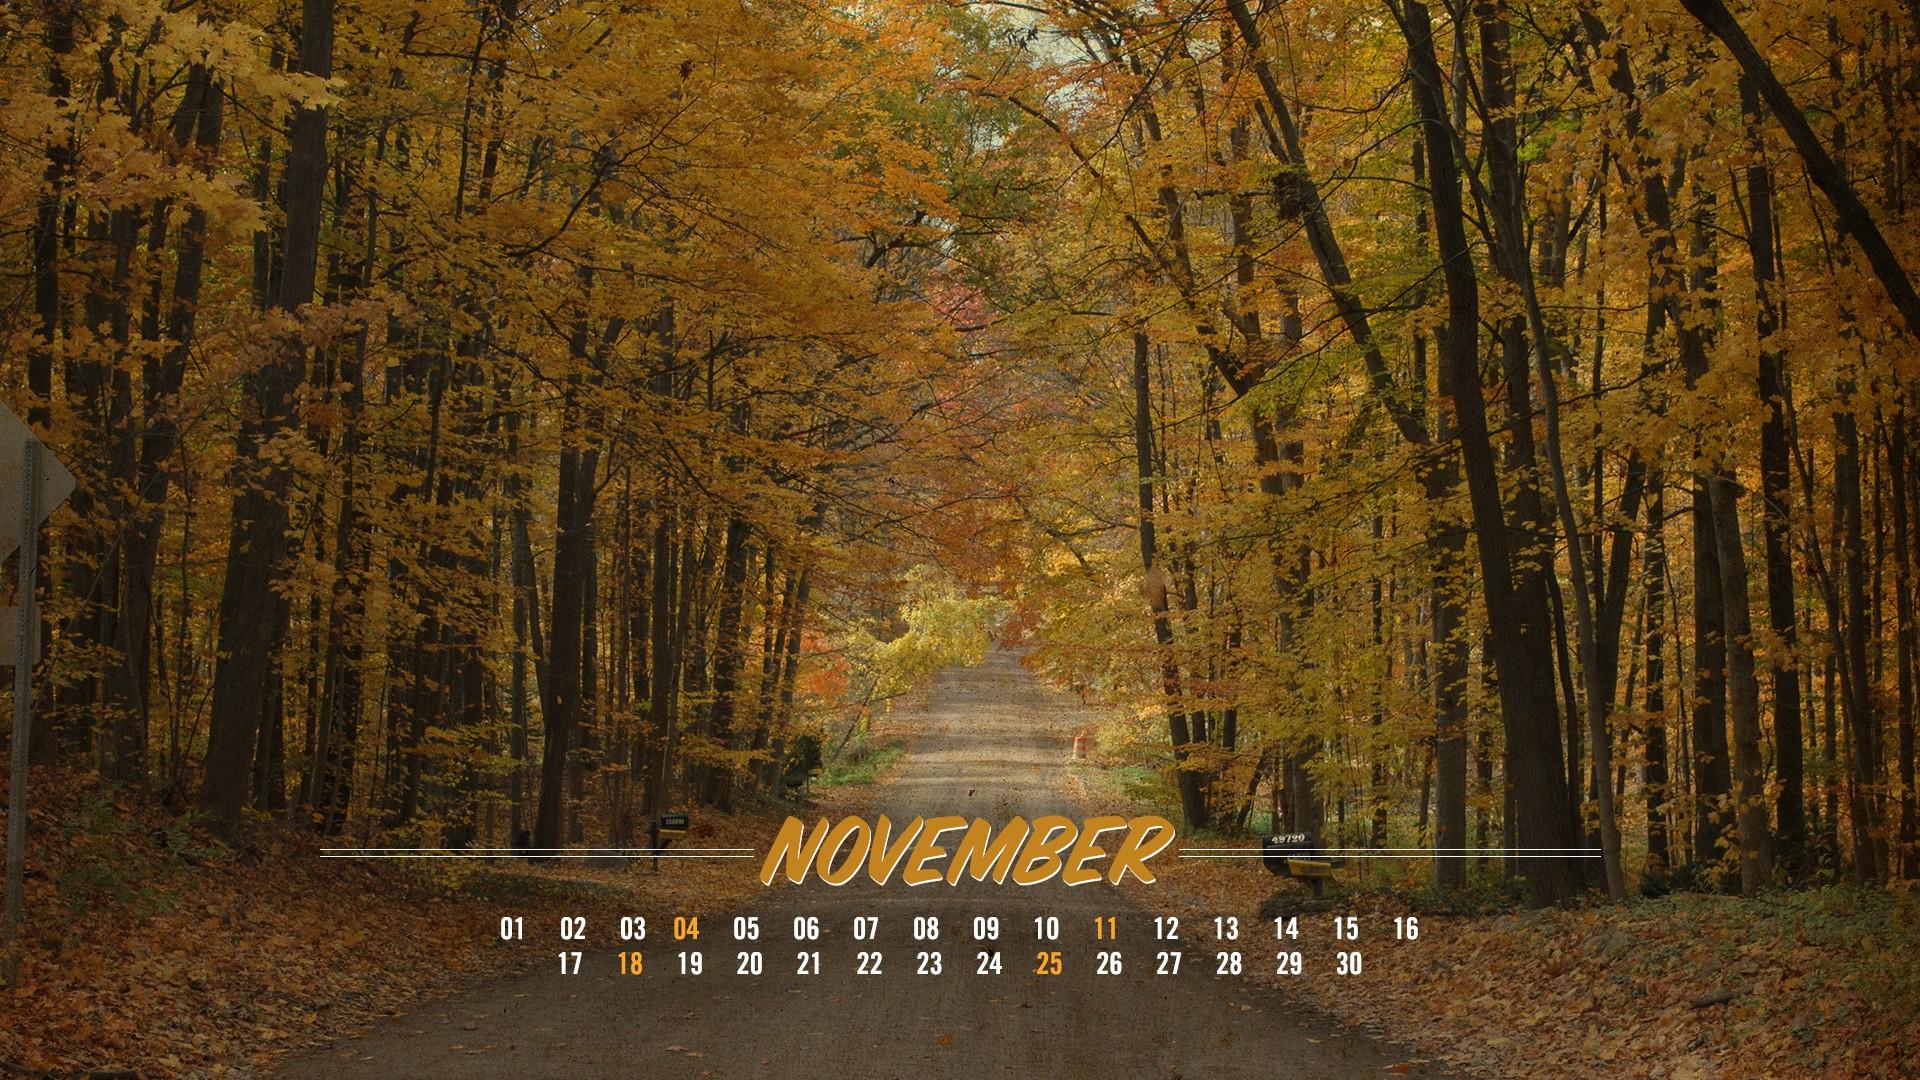 4k november 2019 calendar wallpaper